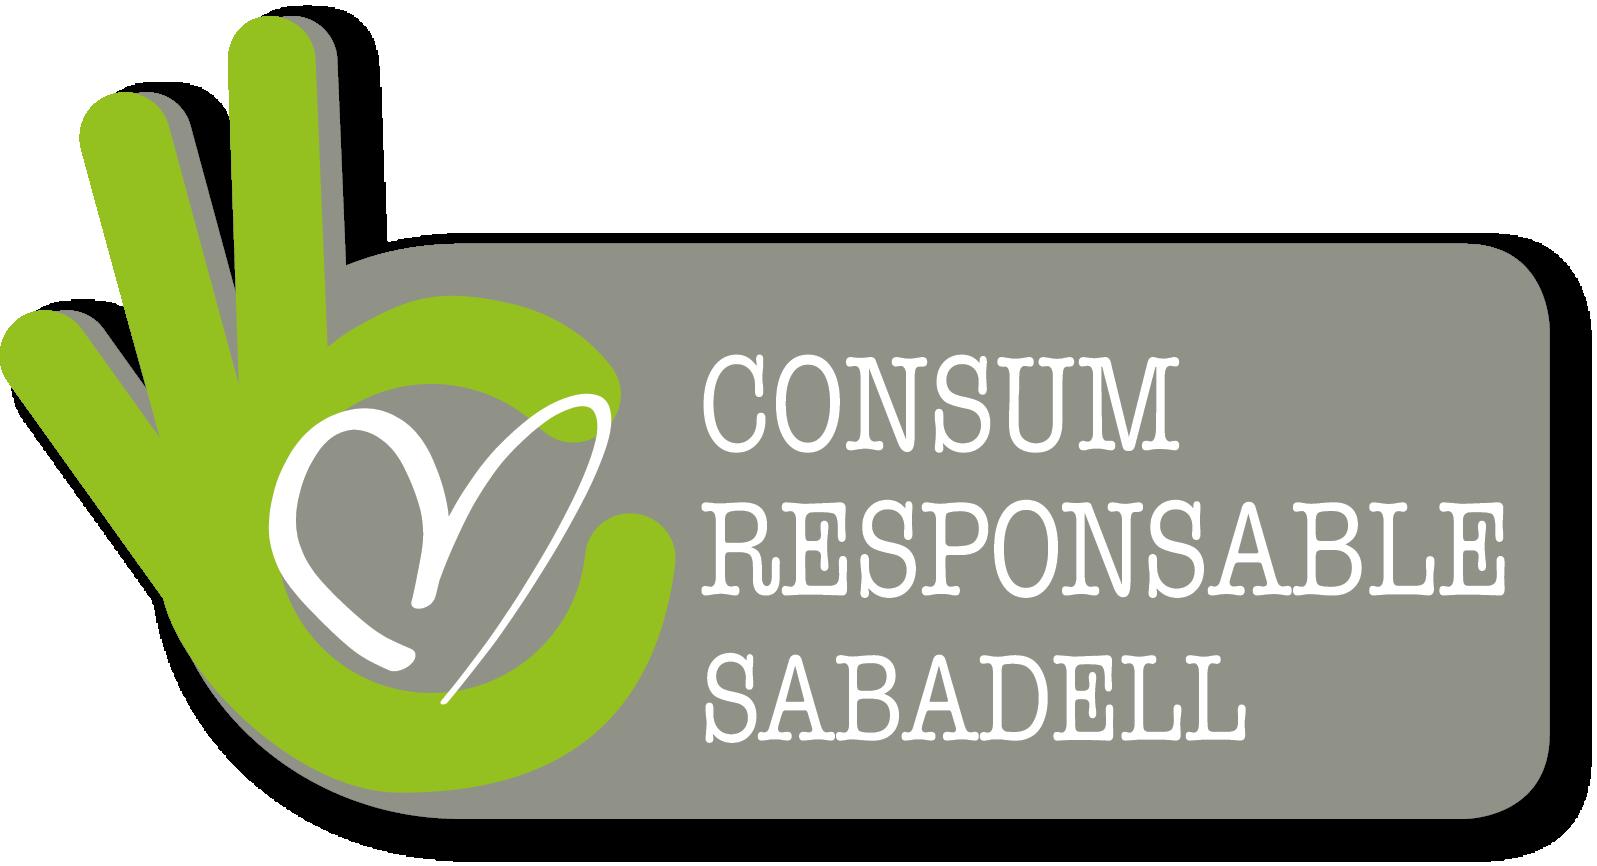 Consum Responsable Sabadell